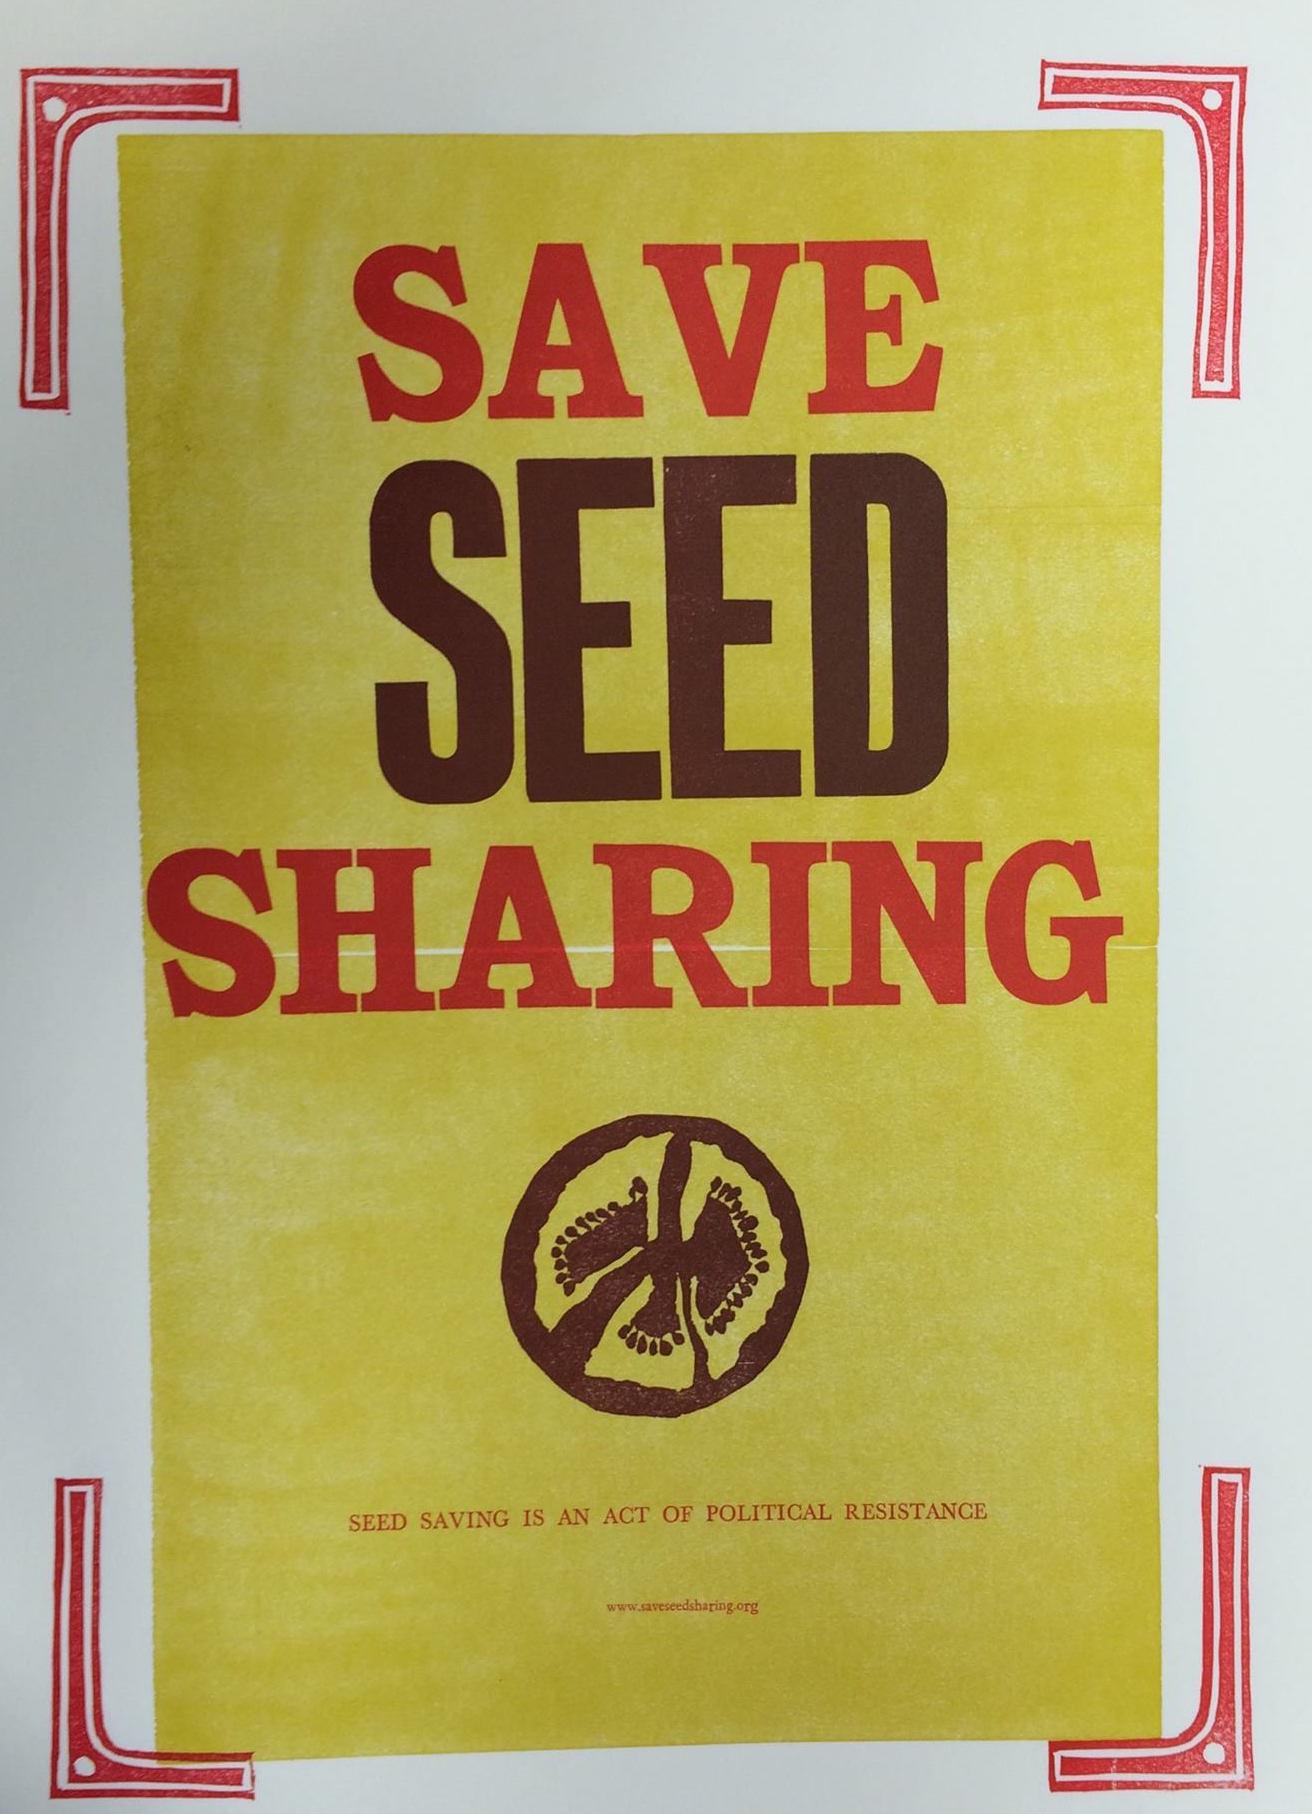 Save_Seed_Sharing_Poster_(Georgia).jpg